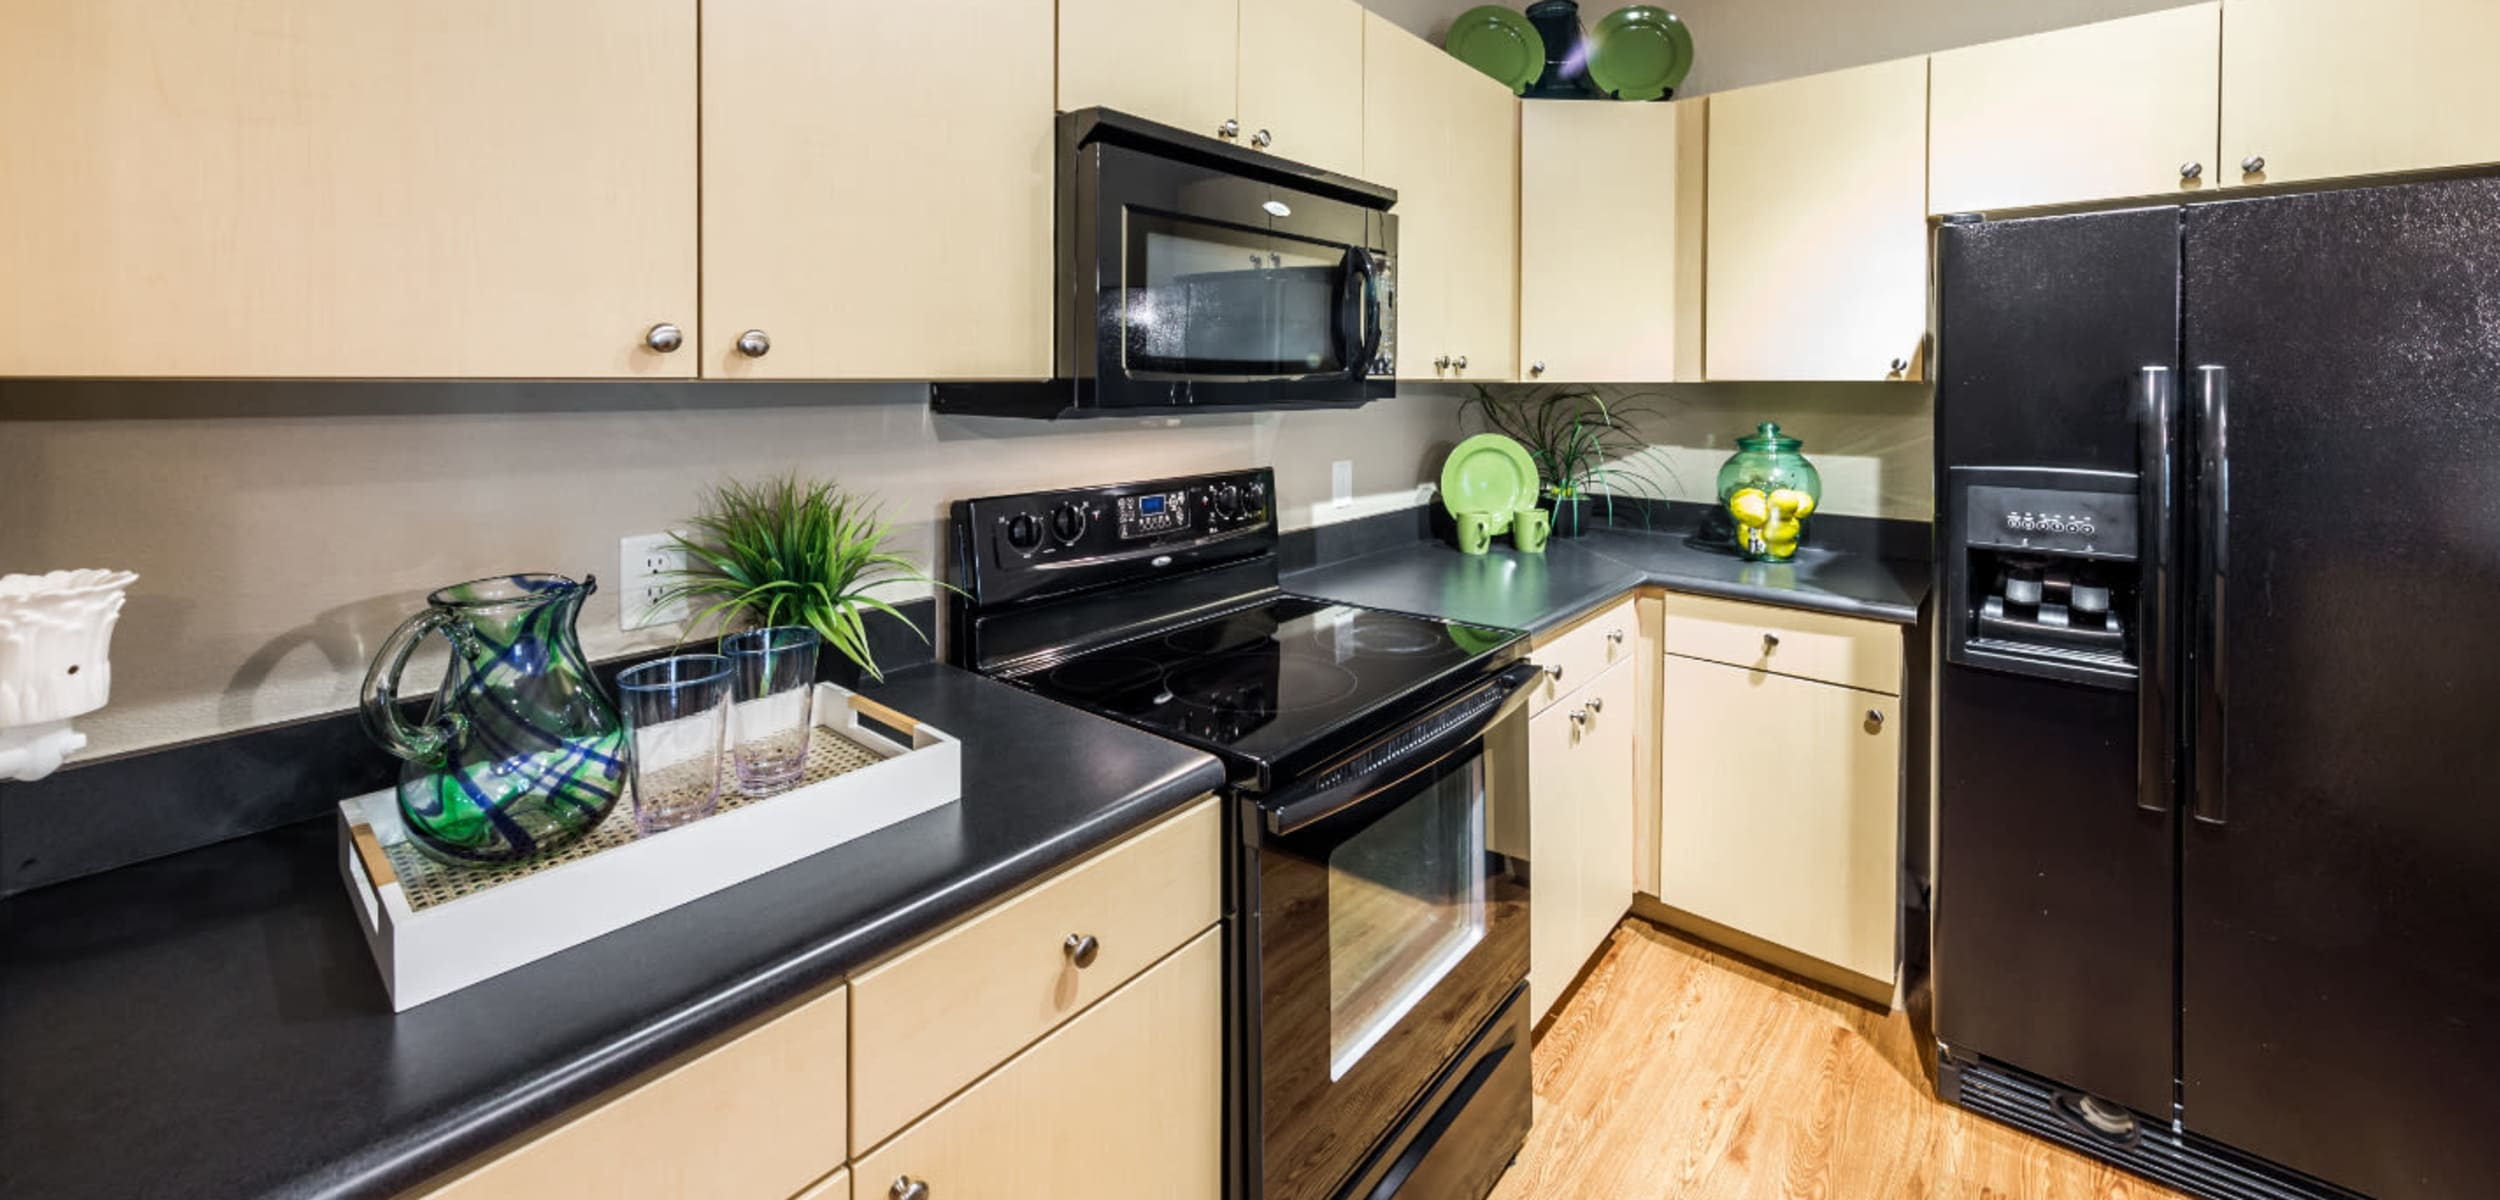 Modern, sleek kitchen at Marquis at Canyon Ridge in Austin, Texas